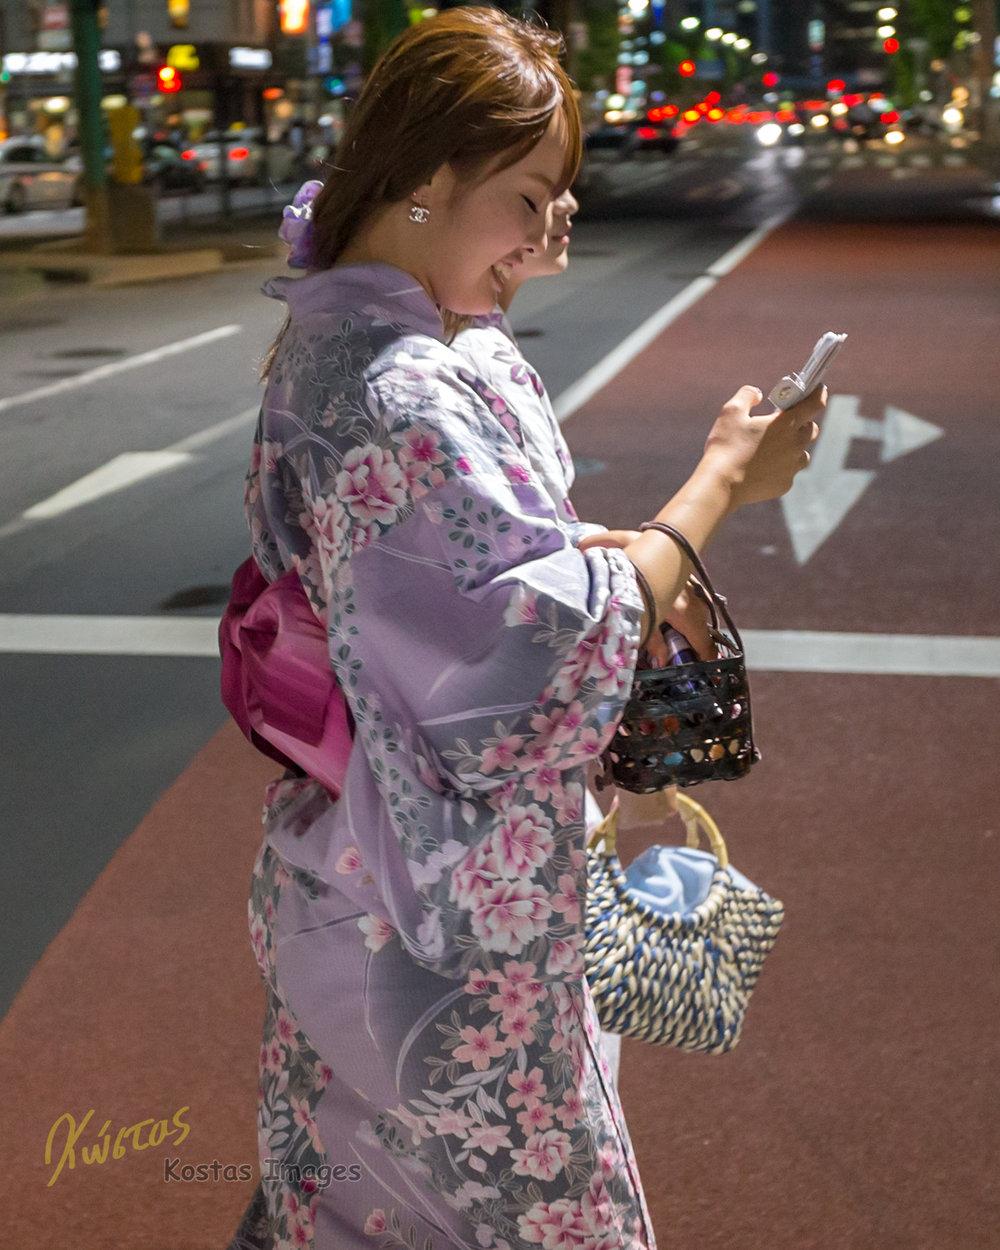 20160830-IMG_5685-Girl in Yukata - Tokyo.jpg